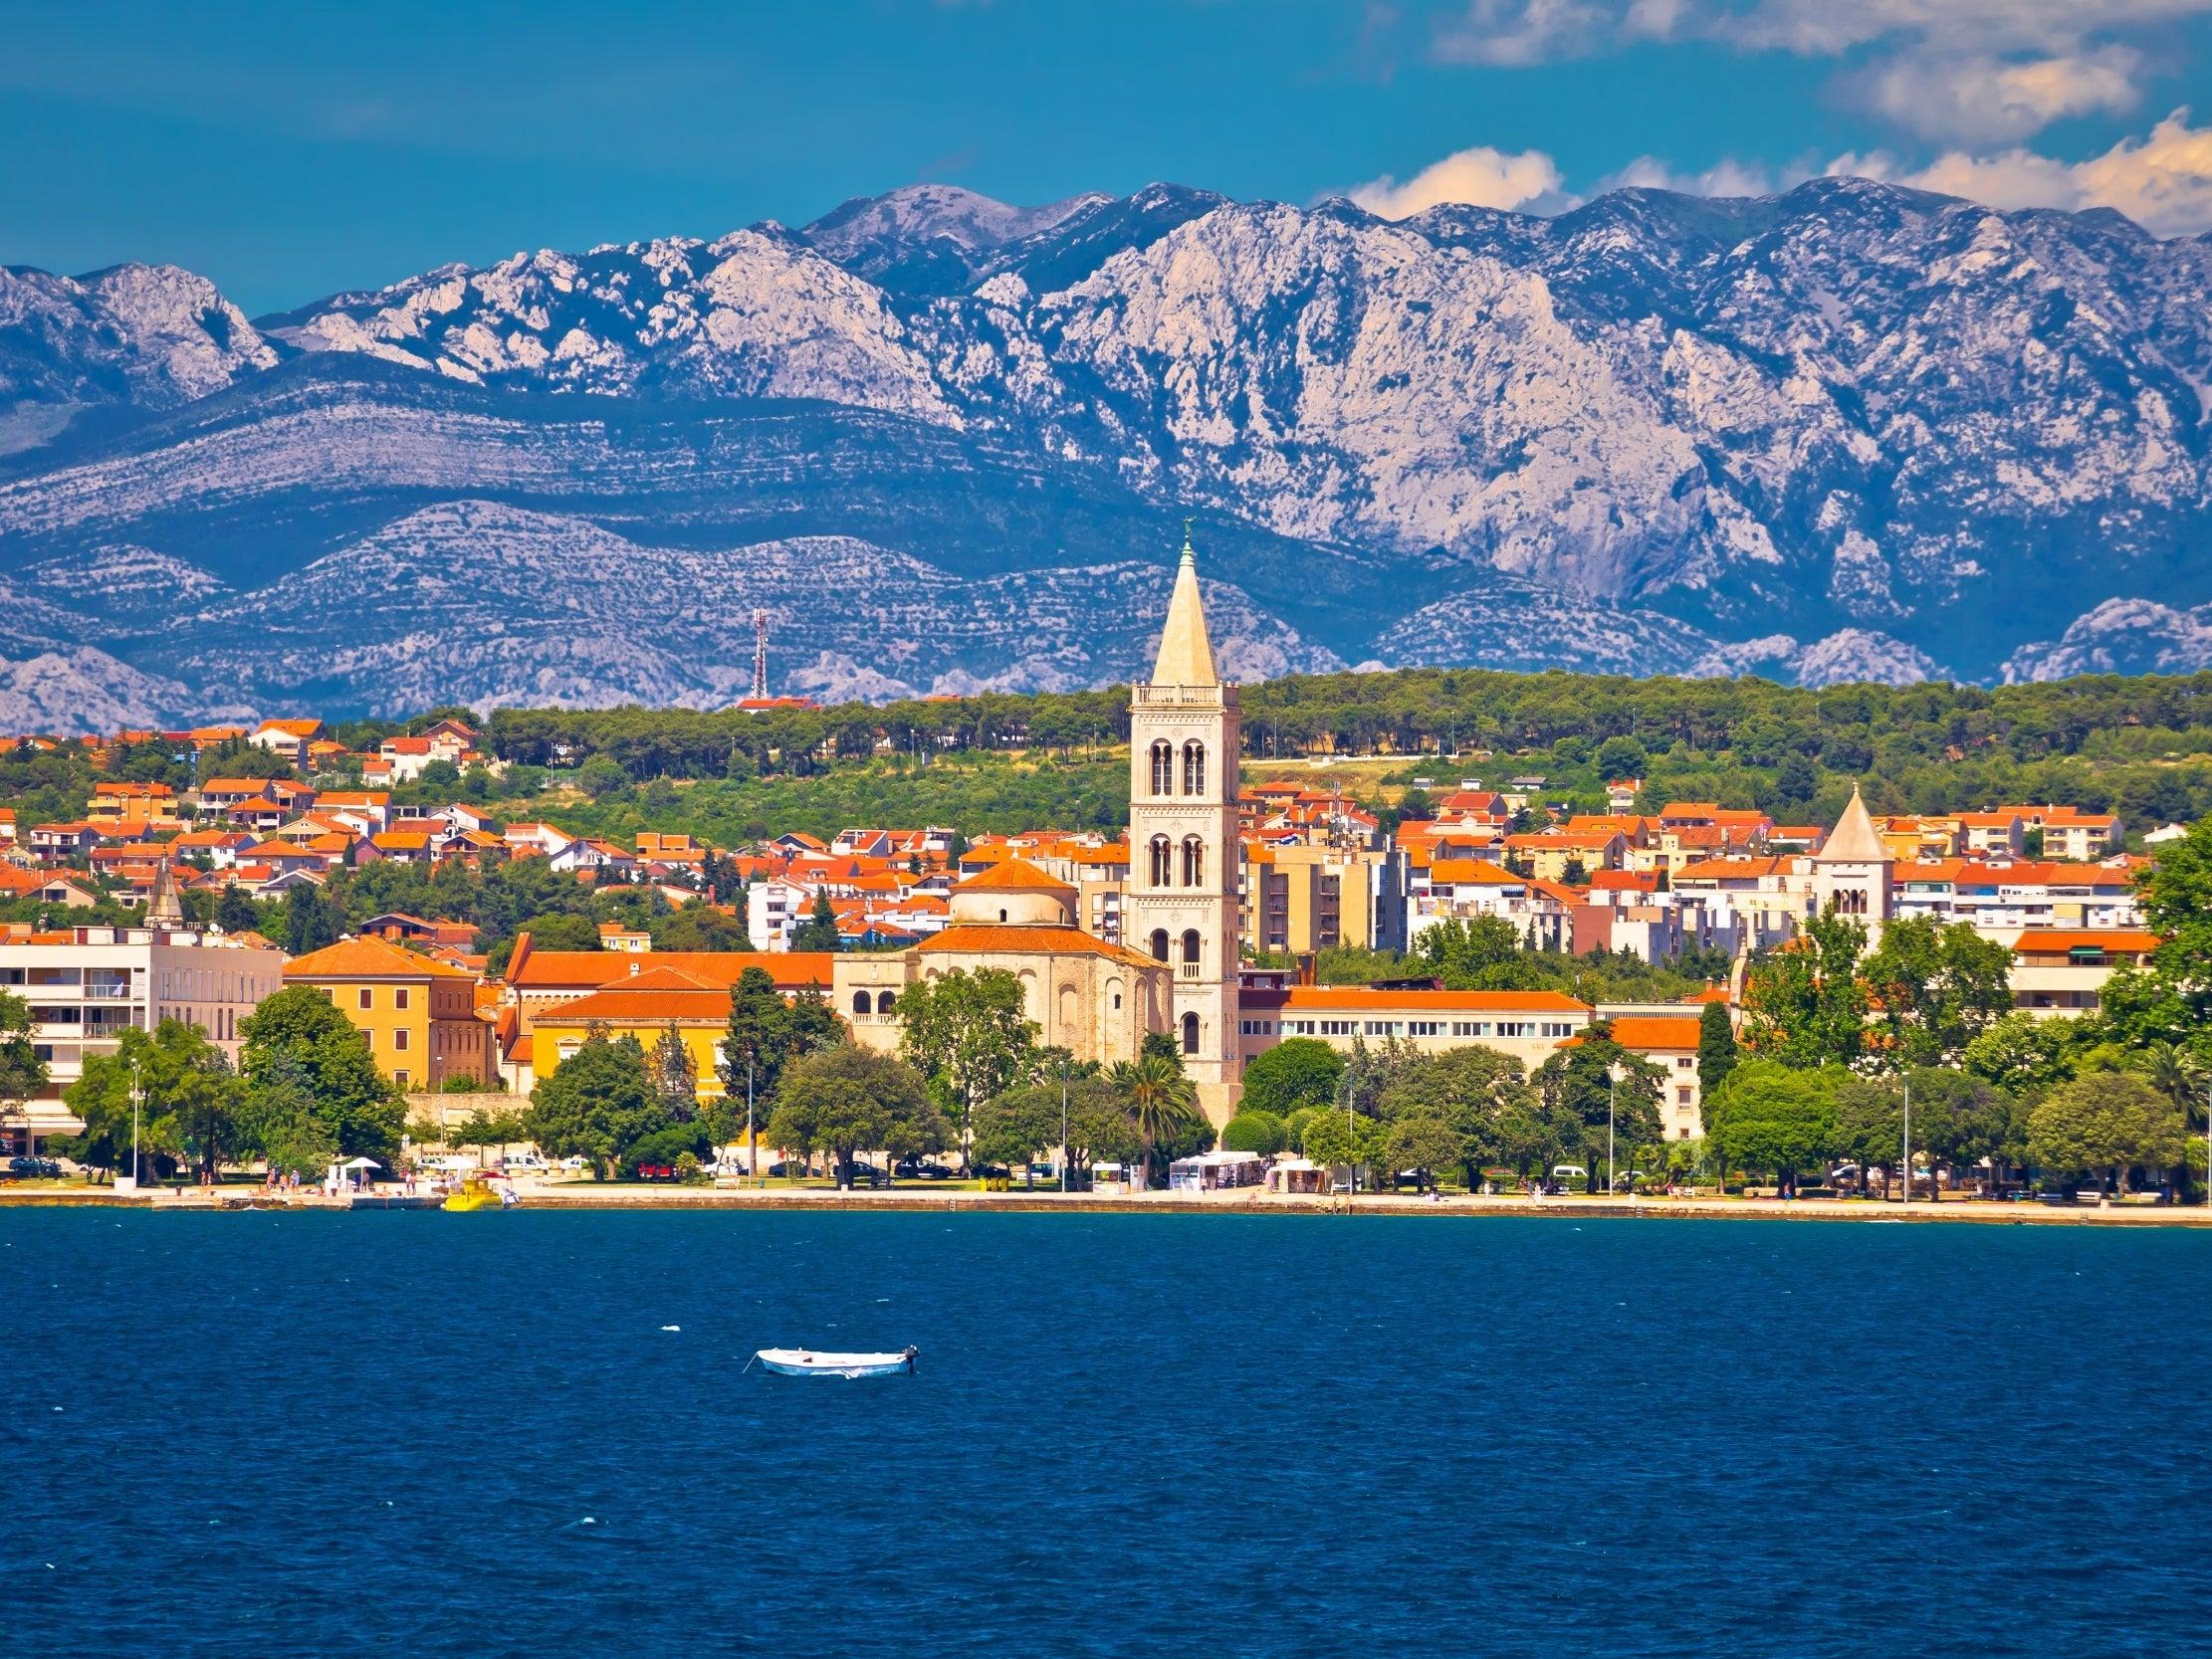 Zadar, Croatia: Incomparable sunsets, a 'sea organ' and untrammelled islands